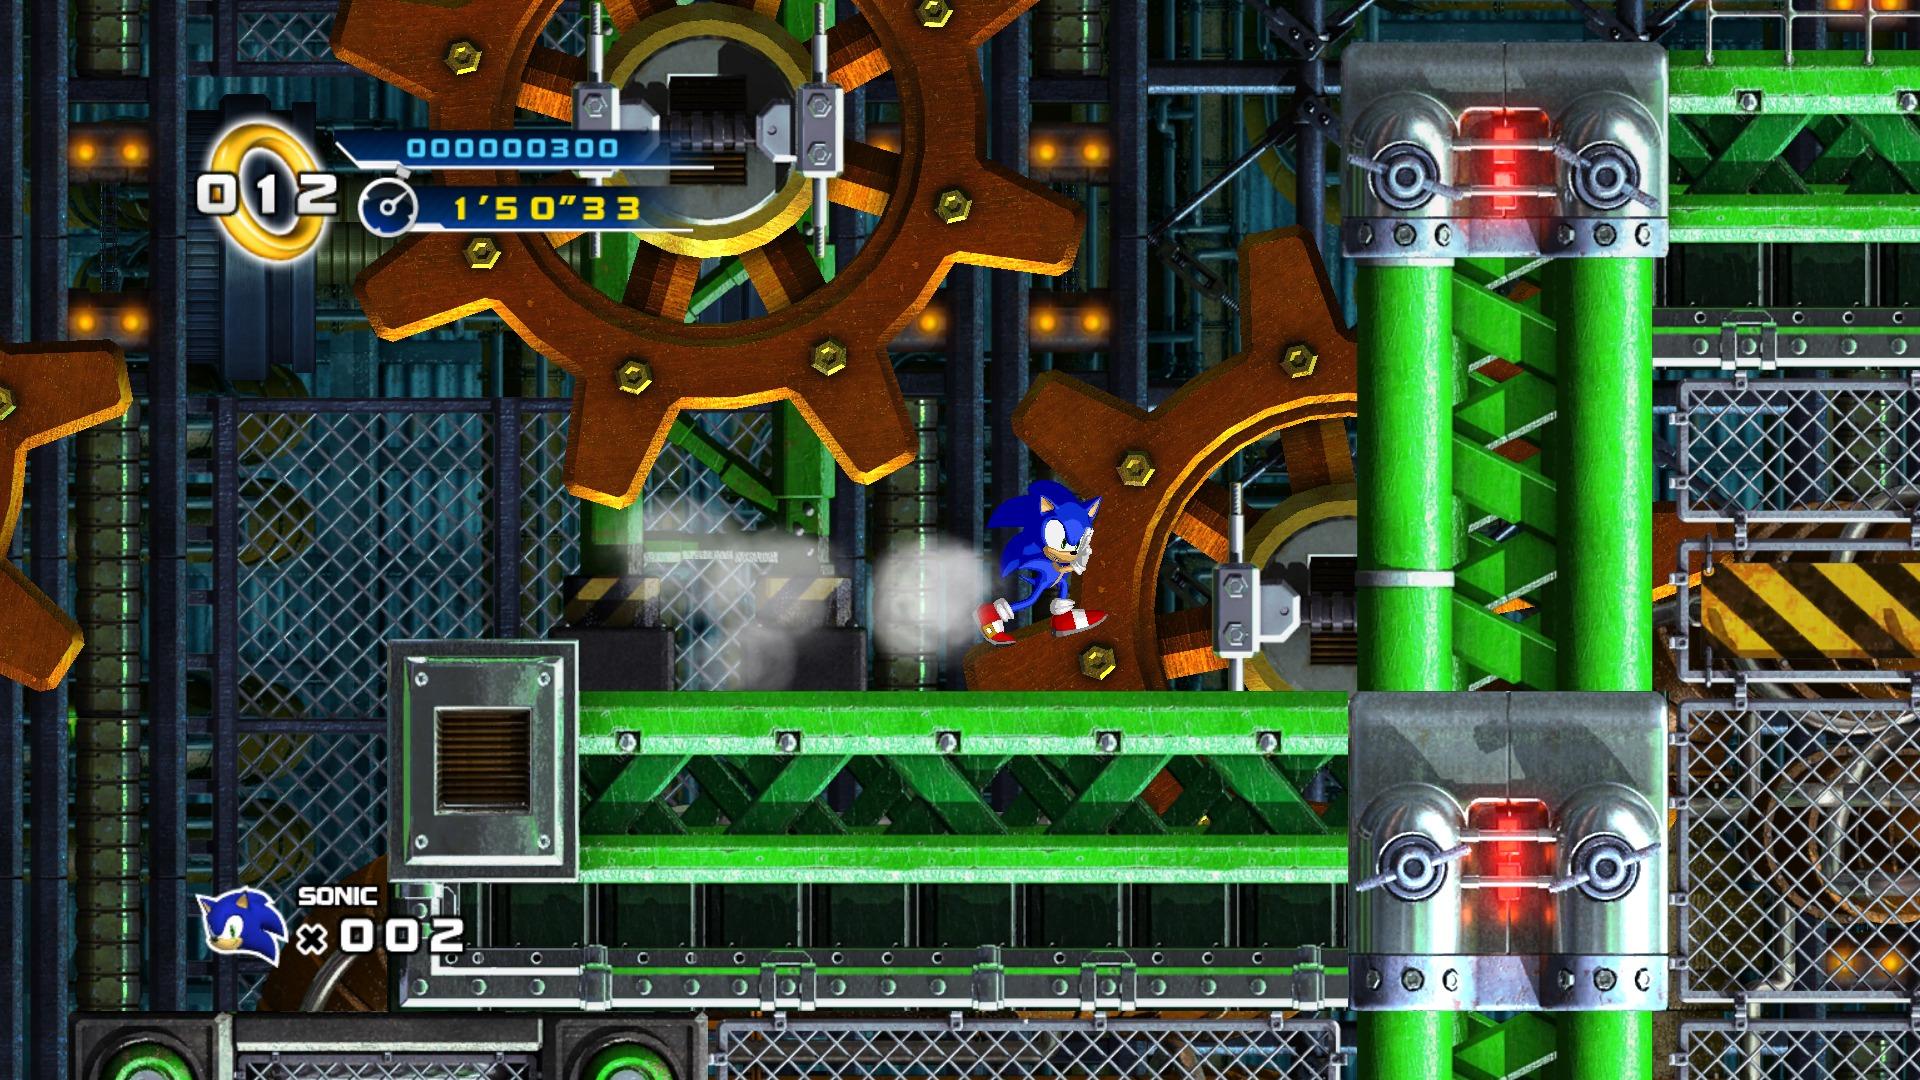 Sonic The Hedgehog 4 Episode 1 - Image 8